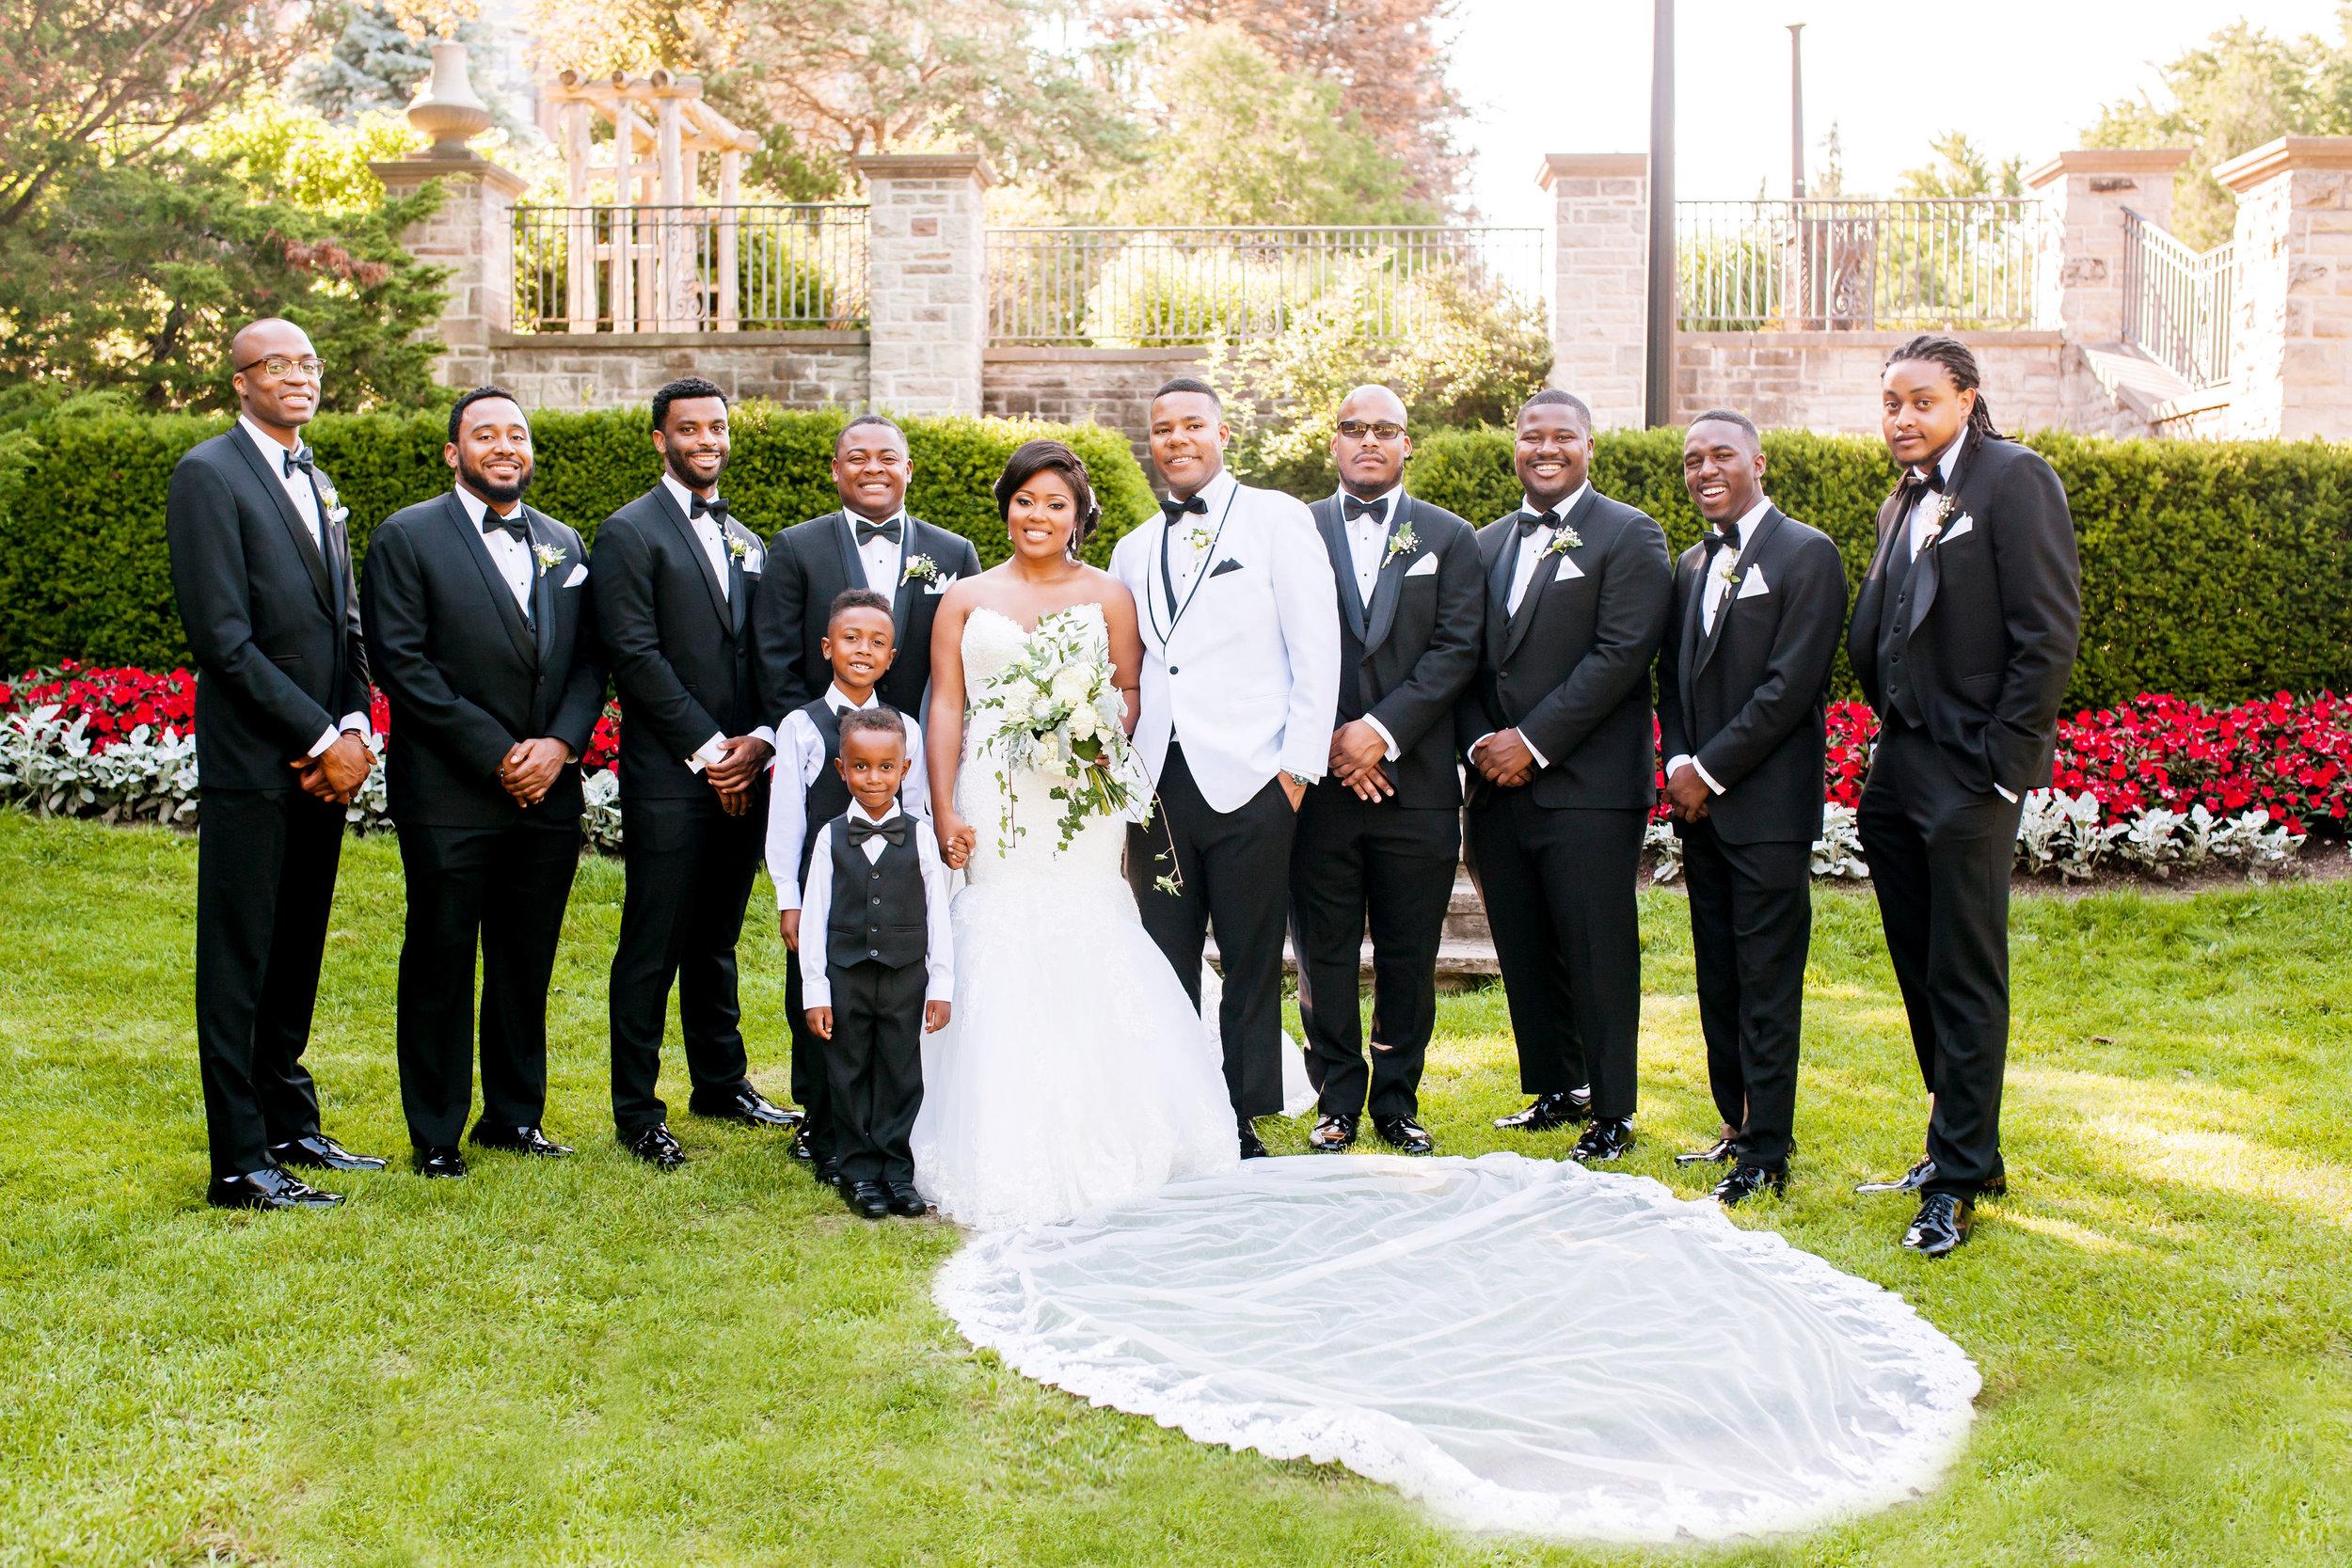 Lavinia_Carl_Wedding_Paradise_Banquet_Hall_Karimah_Gheddai_Photography_11